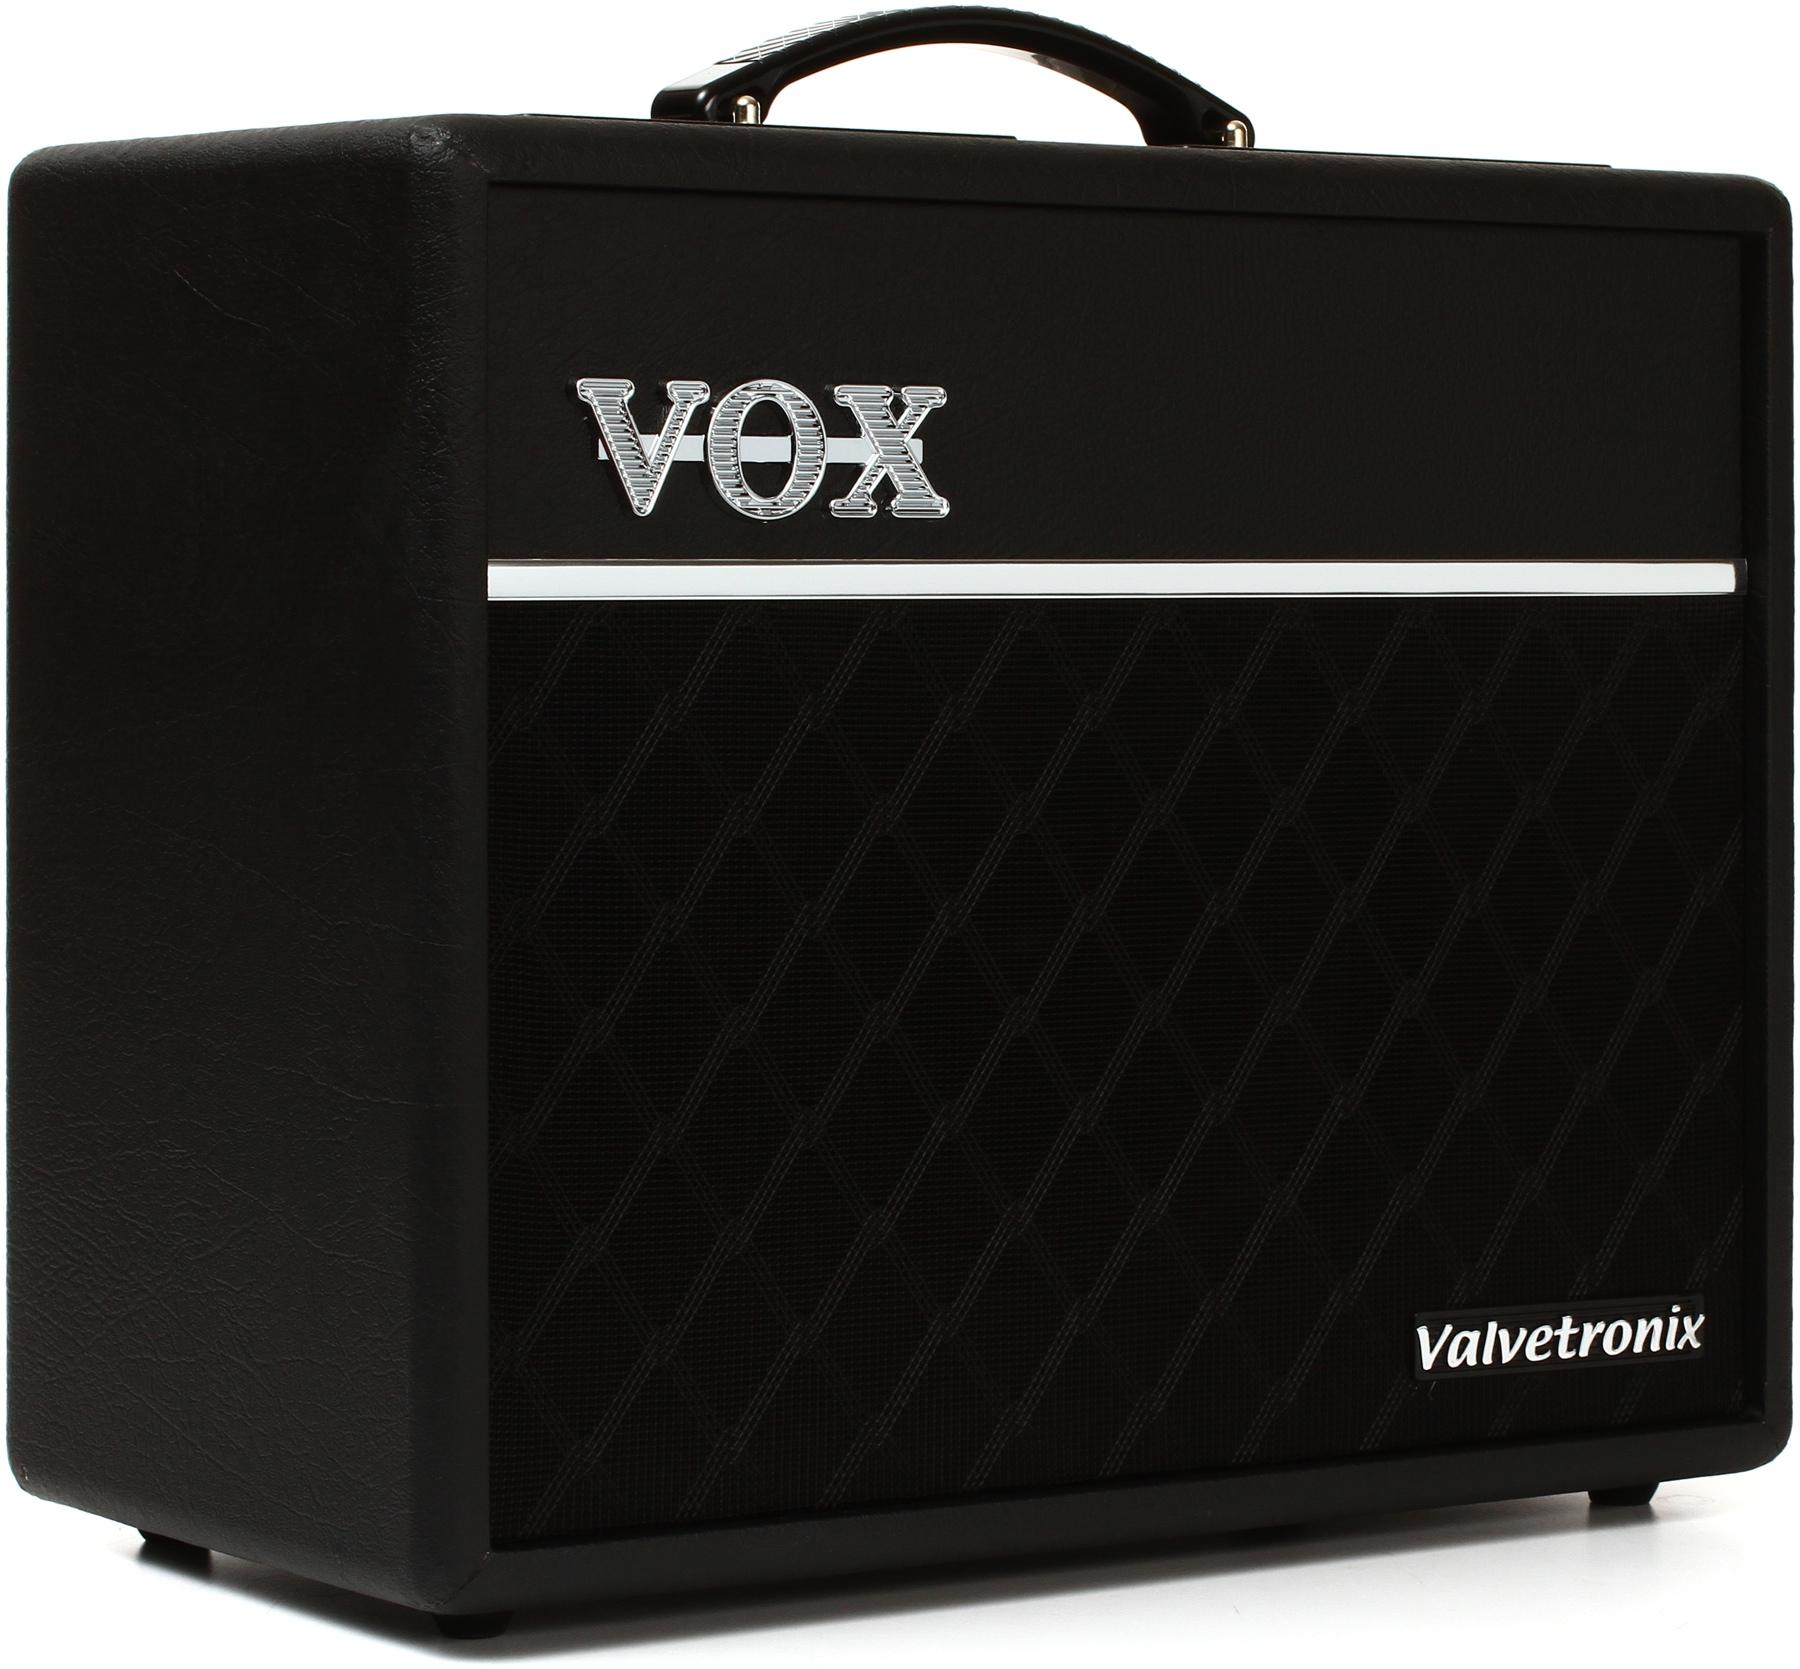 Vox Valvetronix VT20+ Modeling Guitar Amplifier